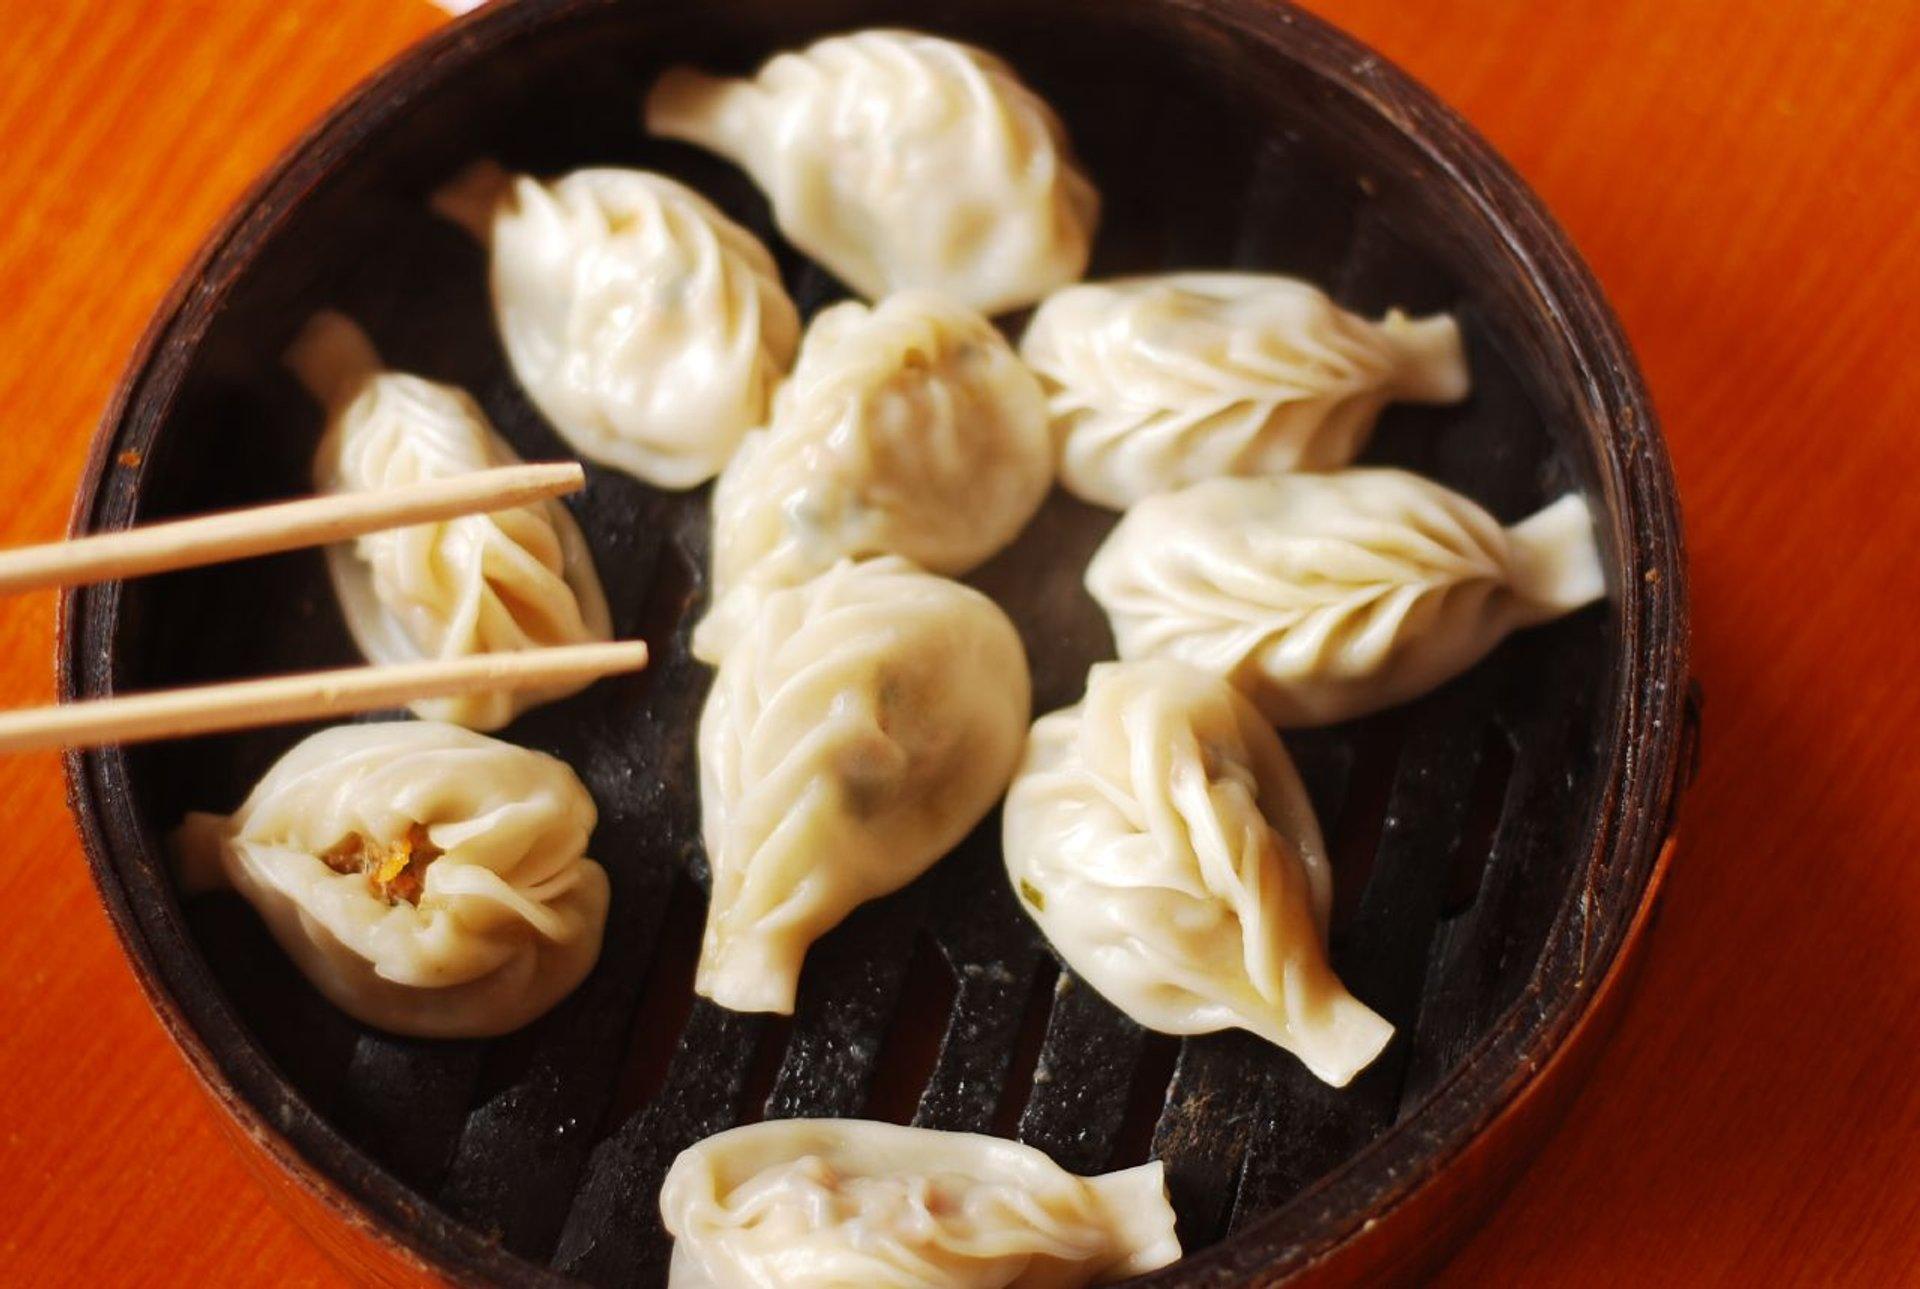 Dumplings in China 2020 - Best Time